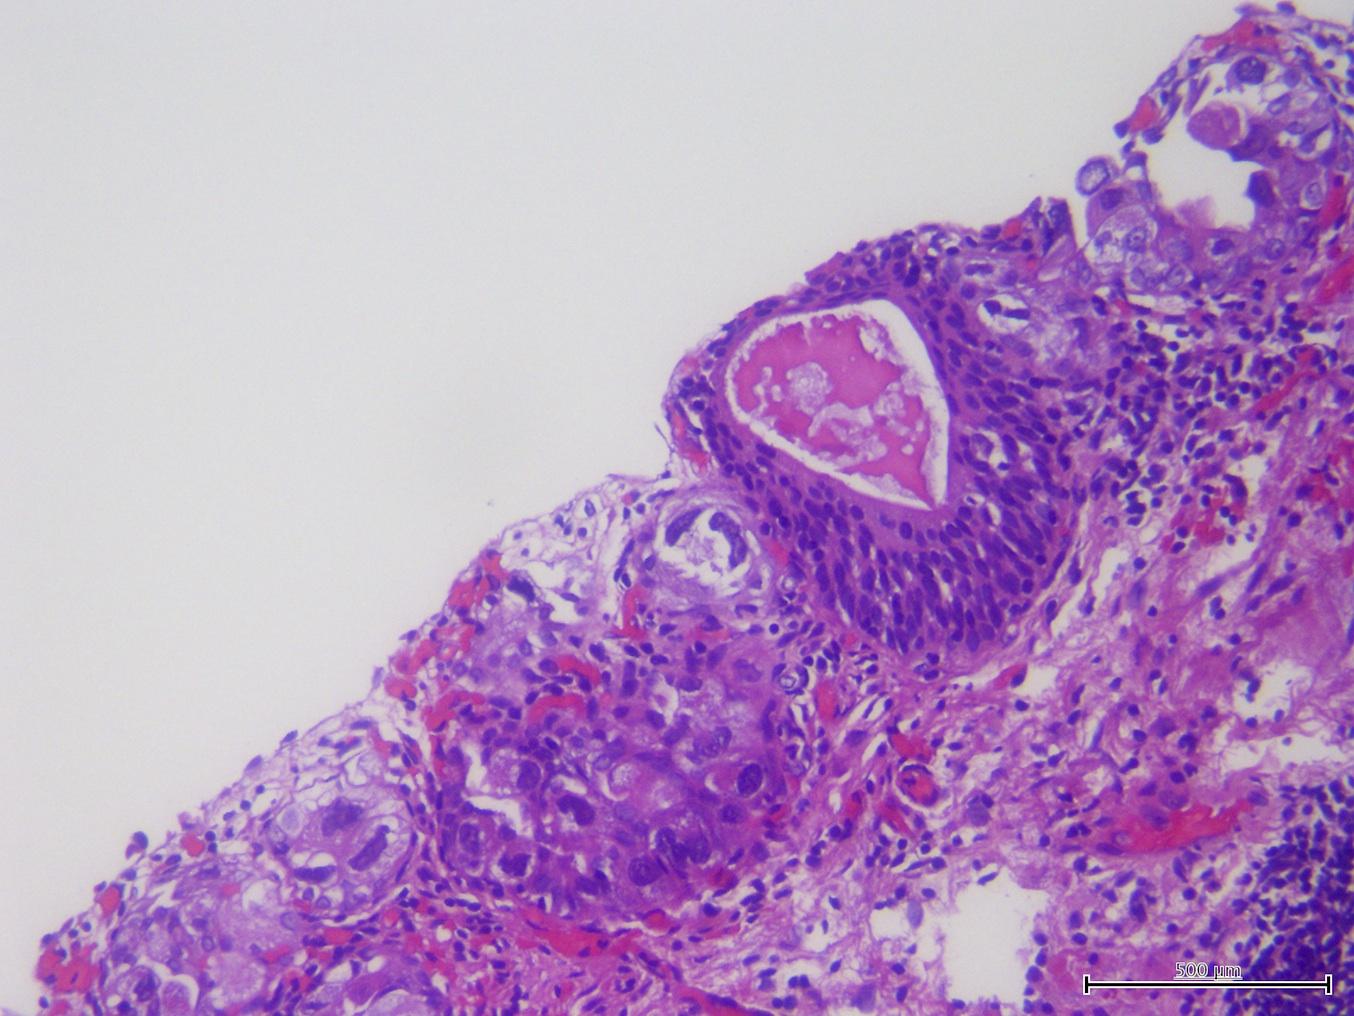 urothelial carcinoma prostate pathology outlines